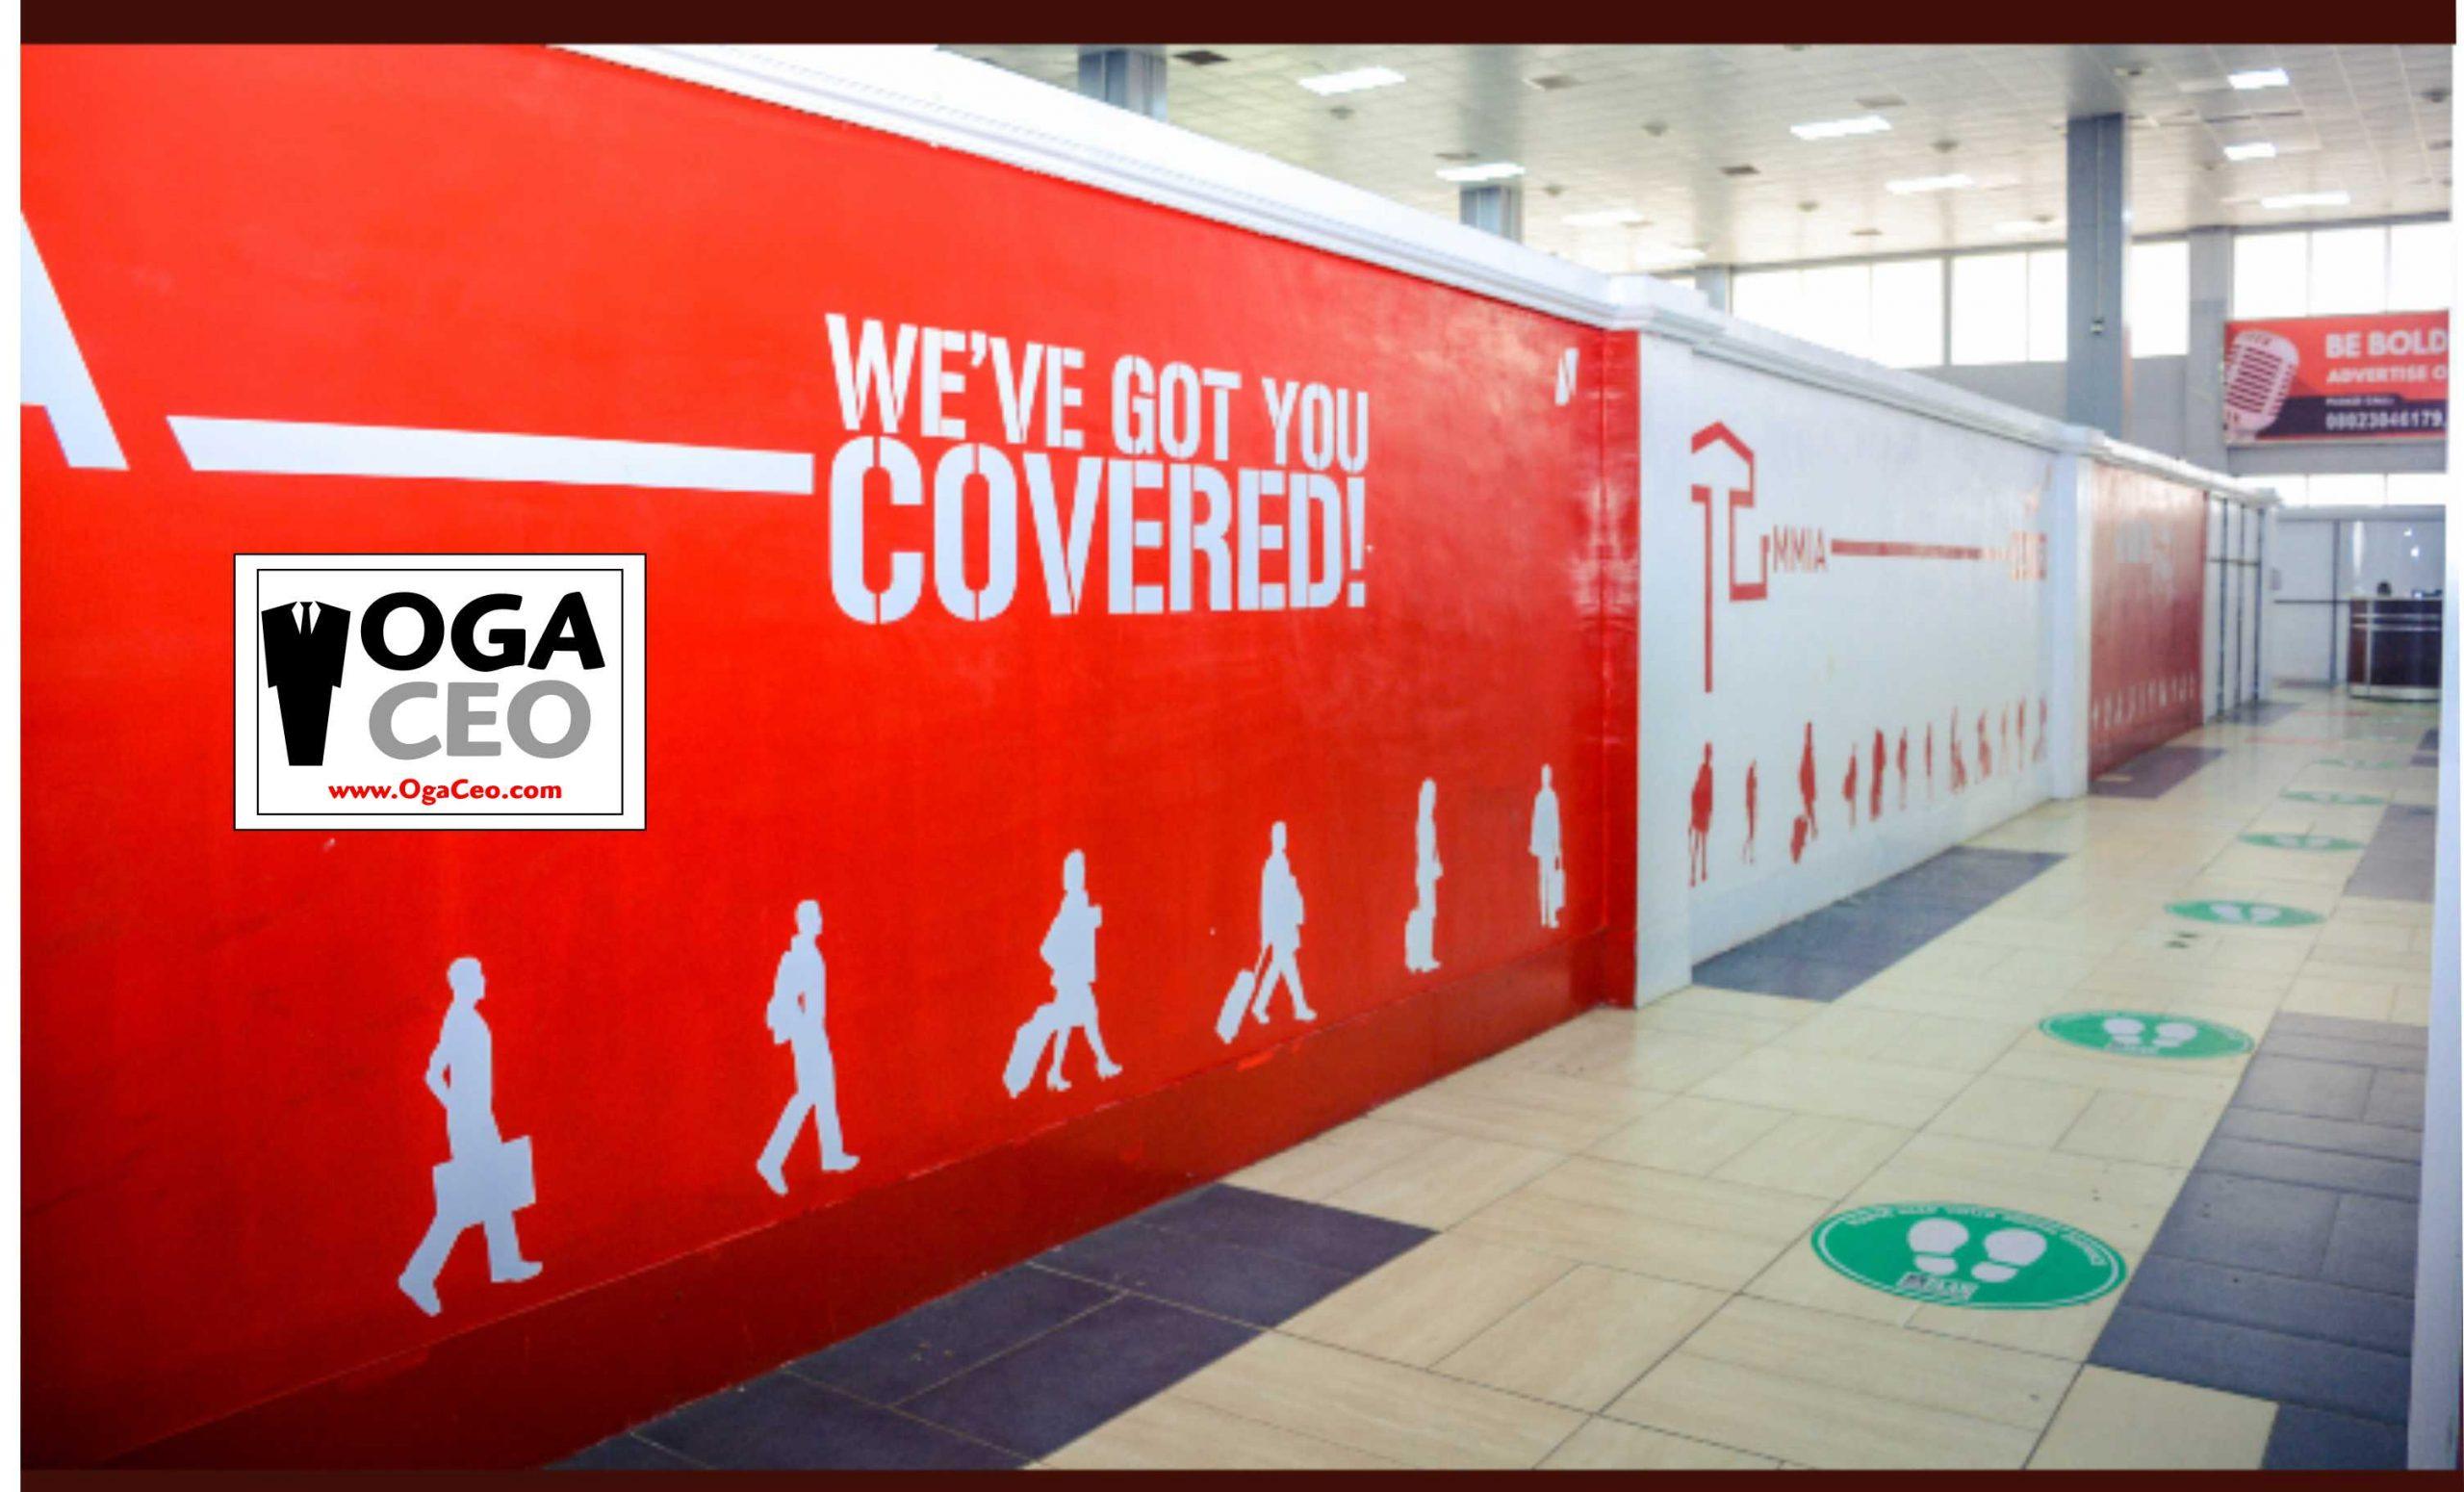 Murtala Muhammed International Airport, bubbles back to life